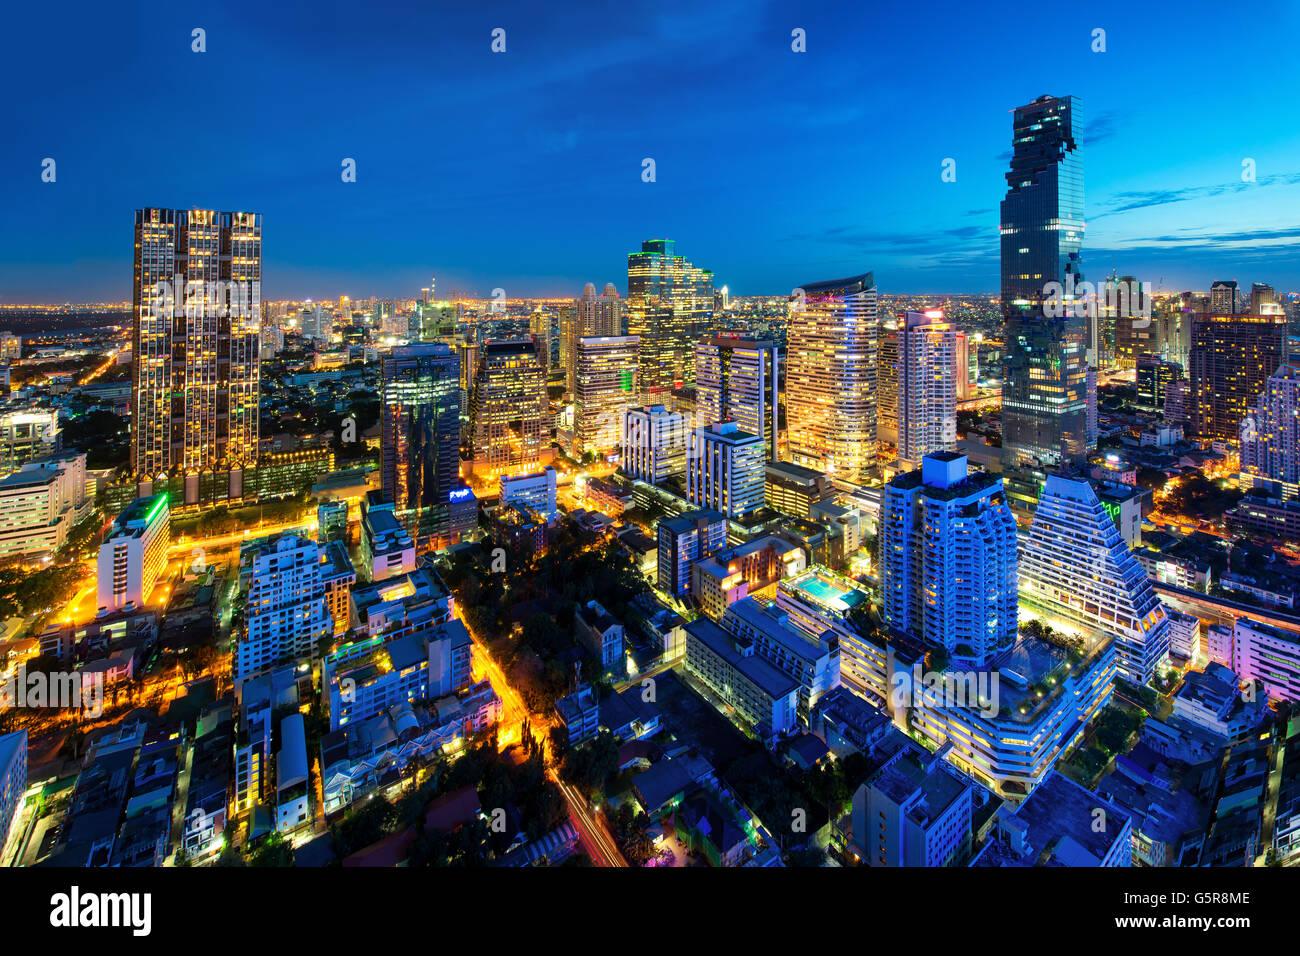 La ville de Bangkok en Thaïlande. Vue de nuit de Bangkok, quartier des affaires en Thaïlande. Gratte-ciel Photo Stock